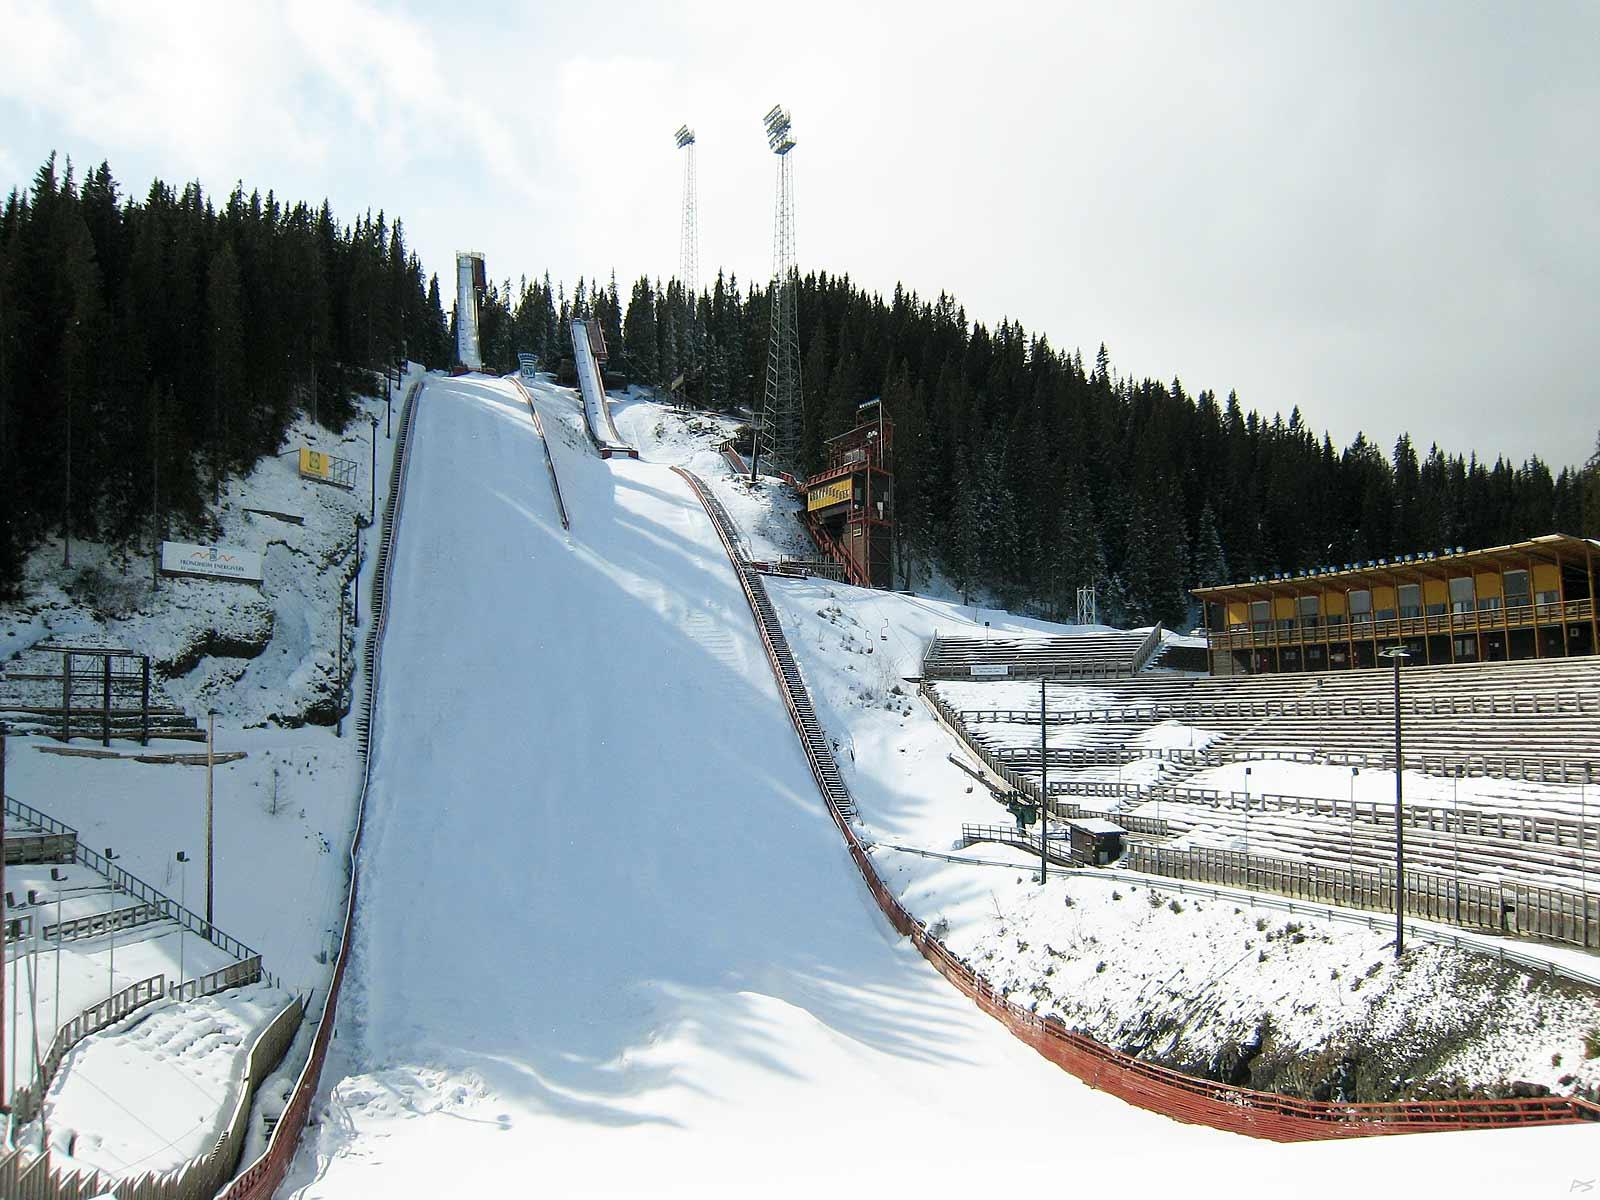 Image: The ski jumping hill Granåsen, Trondheim, Norway